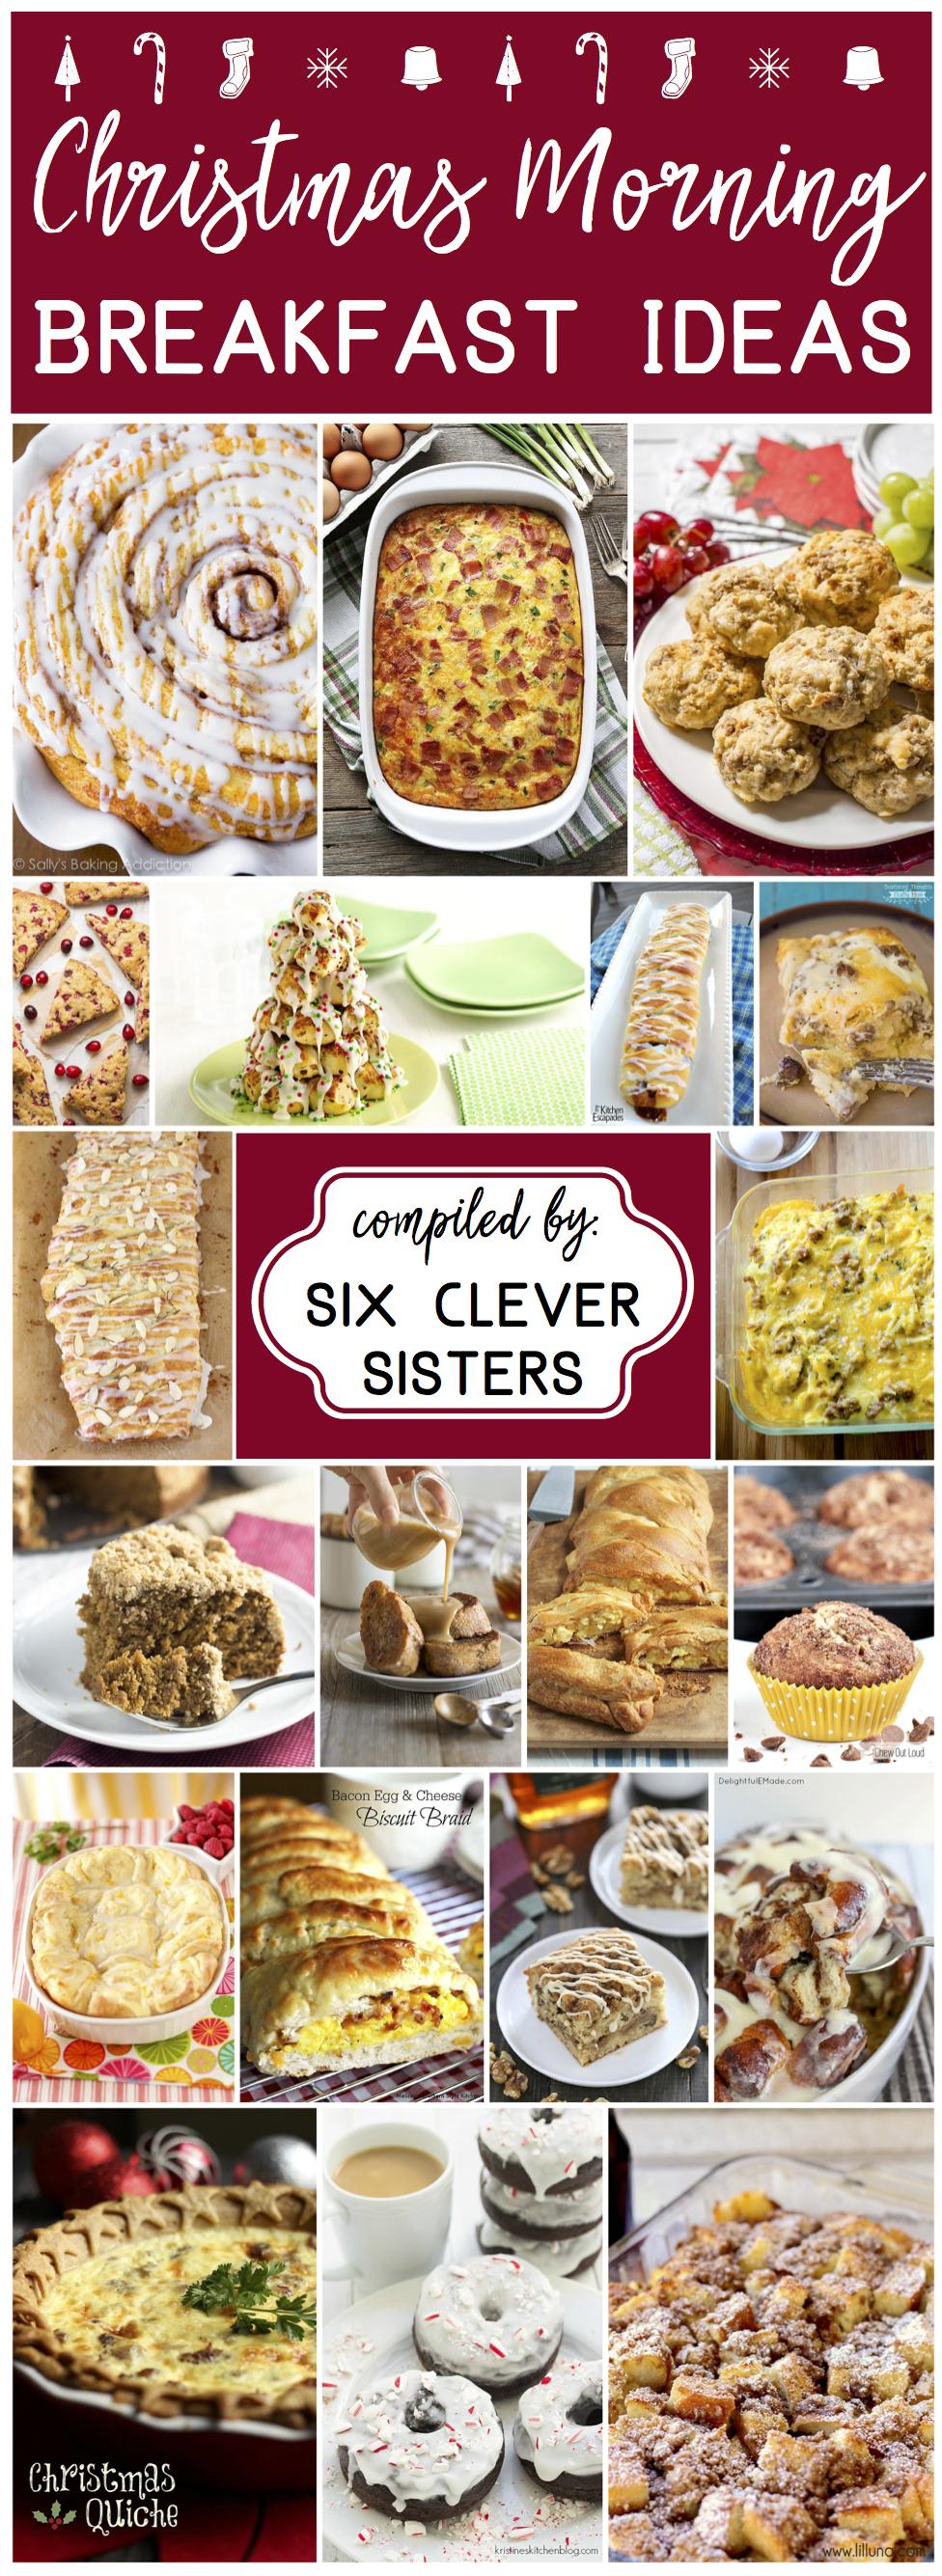 Christmas Morning Breakfast Ideas #breakfast #makeahead #cinnamon #parties #holiday #recipes